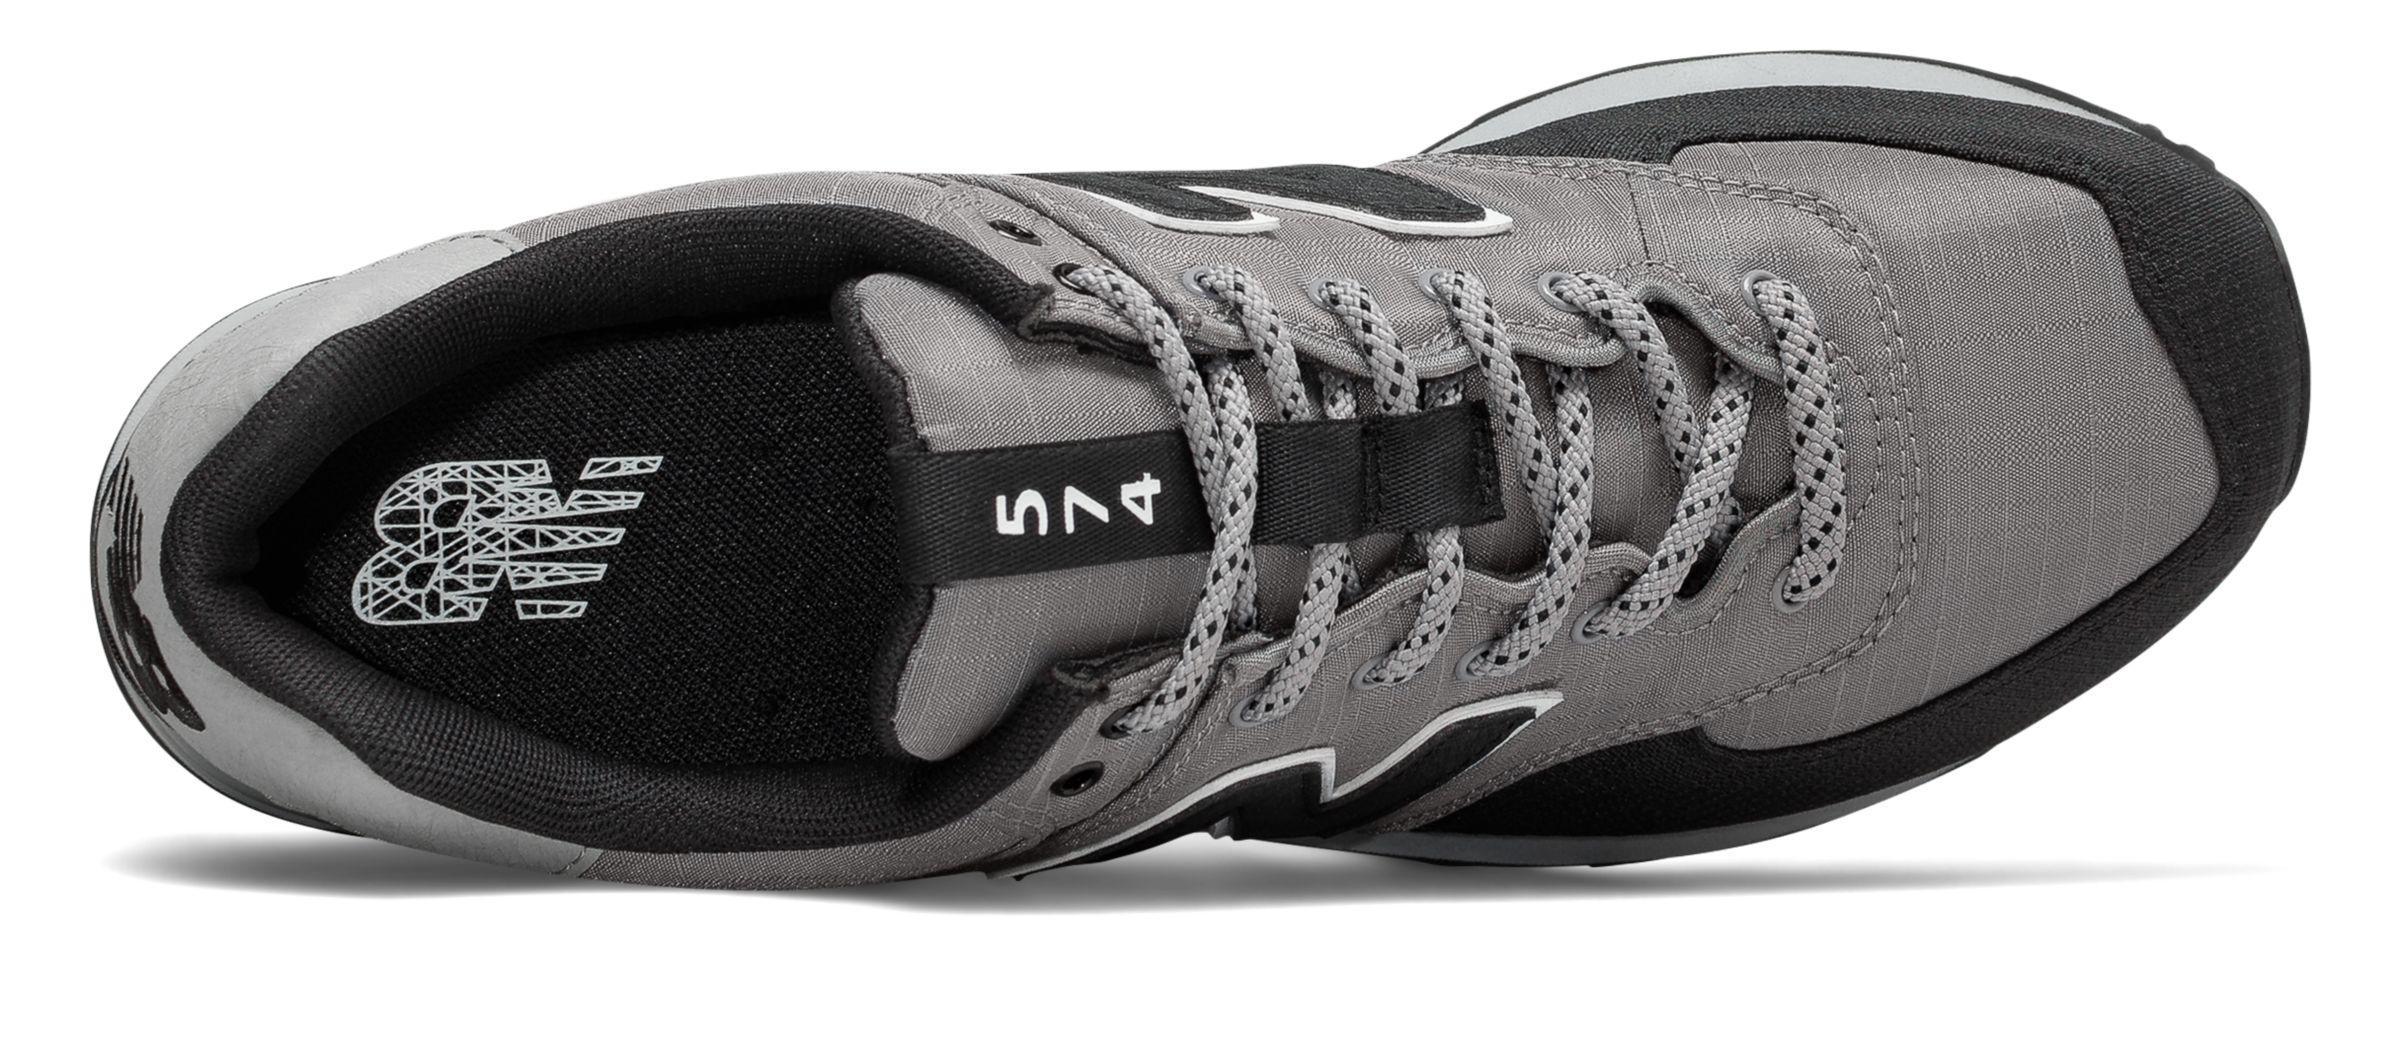 sports shoes ece0f d10f1 New Balance Black 574 Outdoor Escape for men